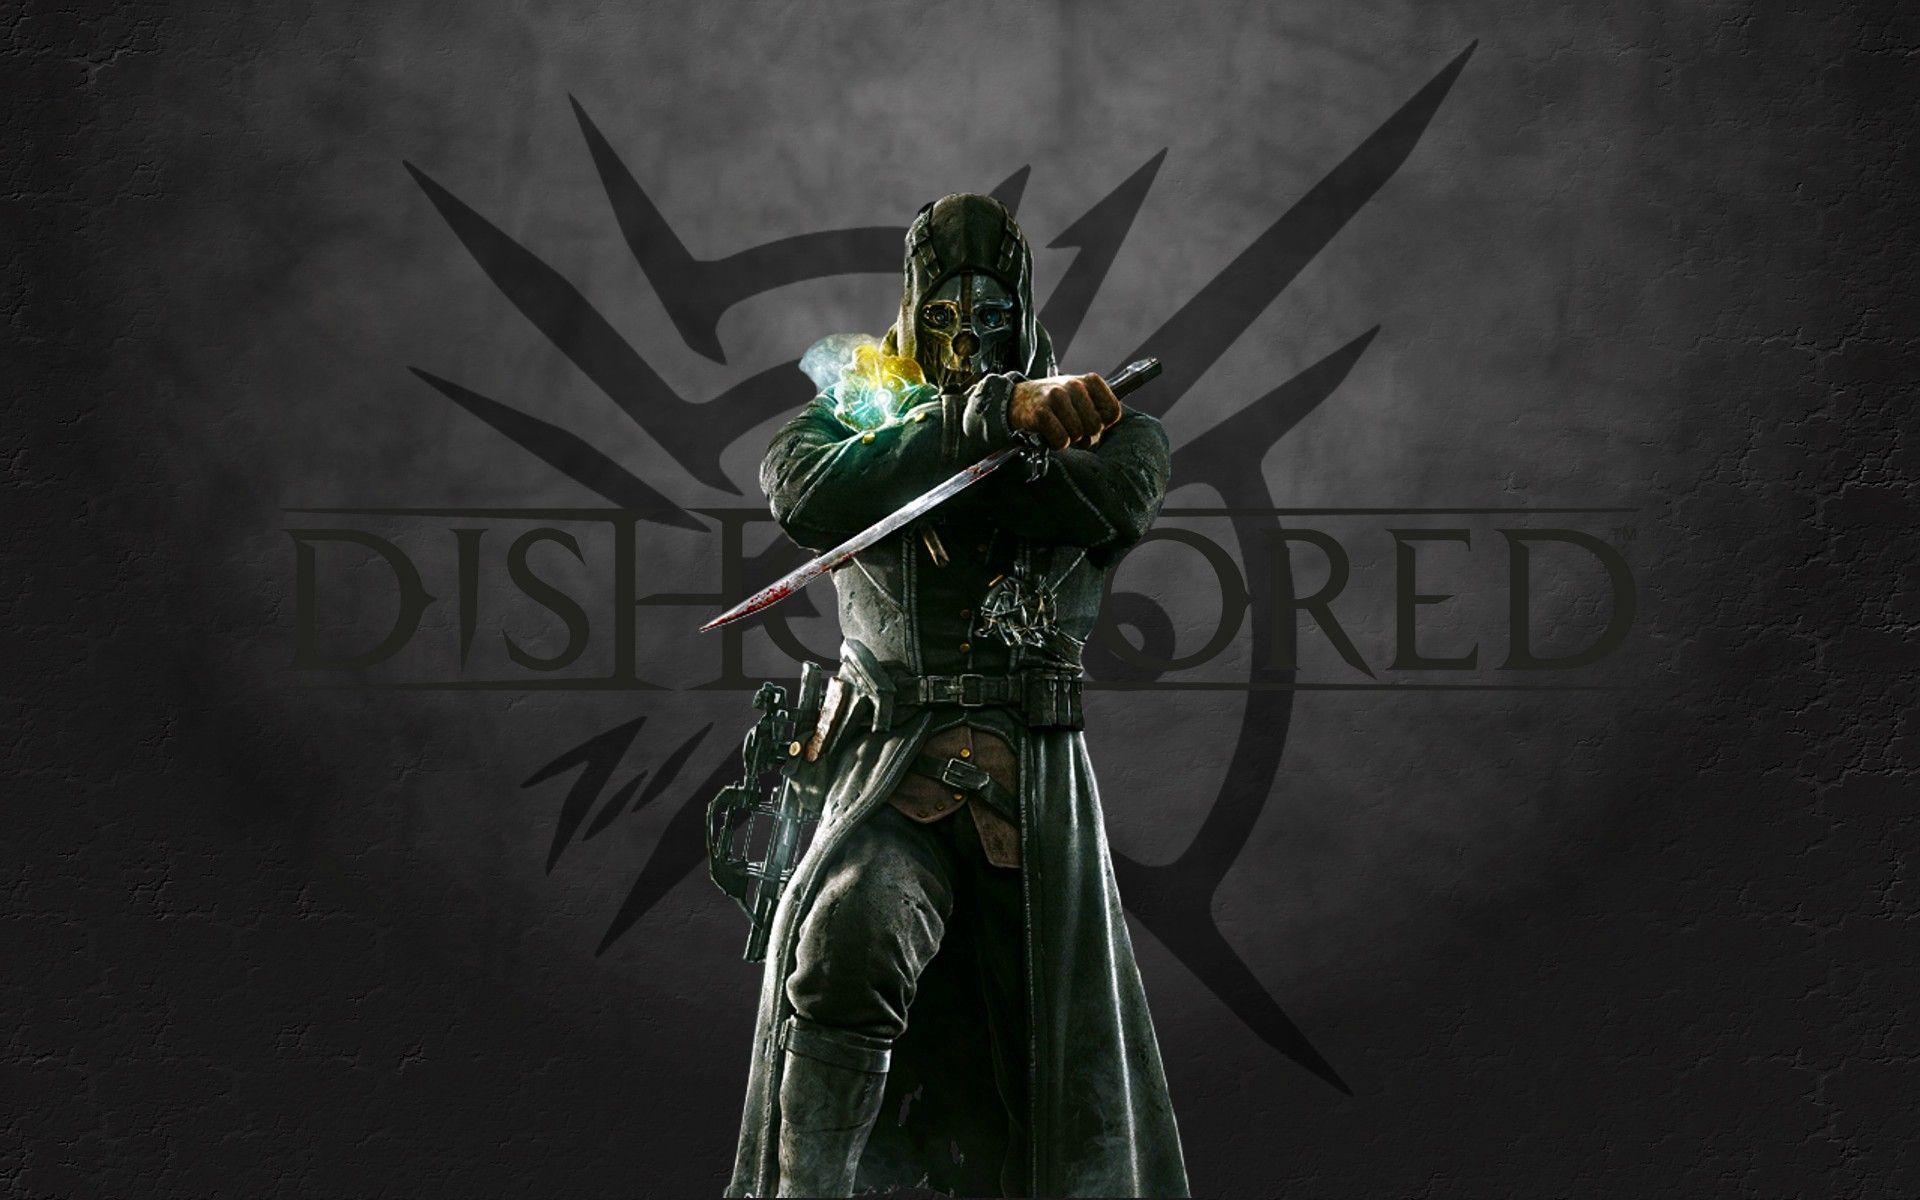 Dishonored 2 4k Wallpaper 3 Wallpaper 3840x2160 1051568